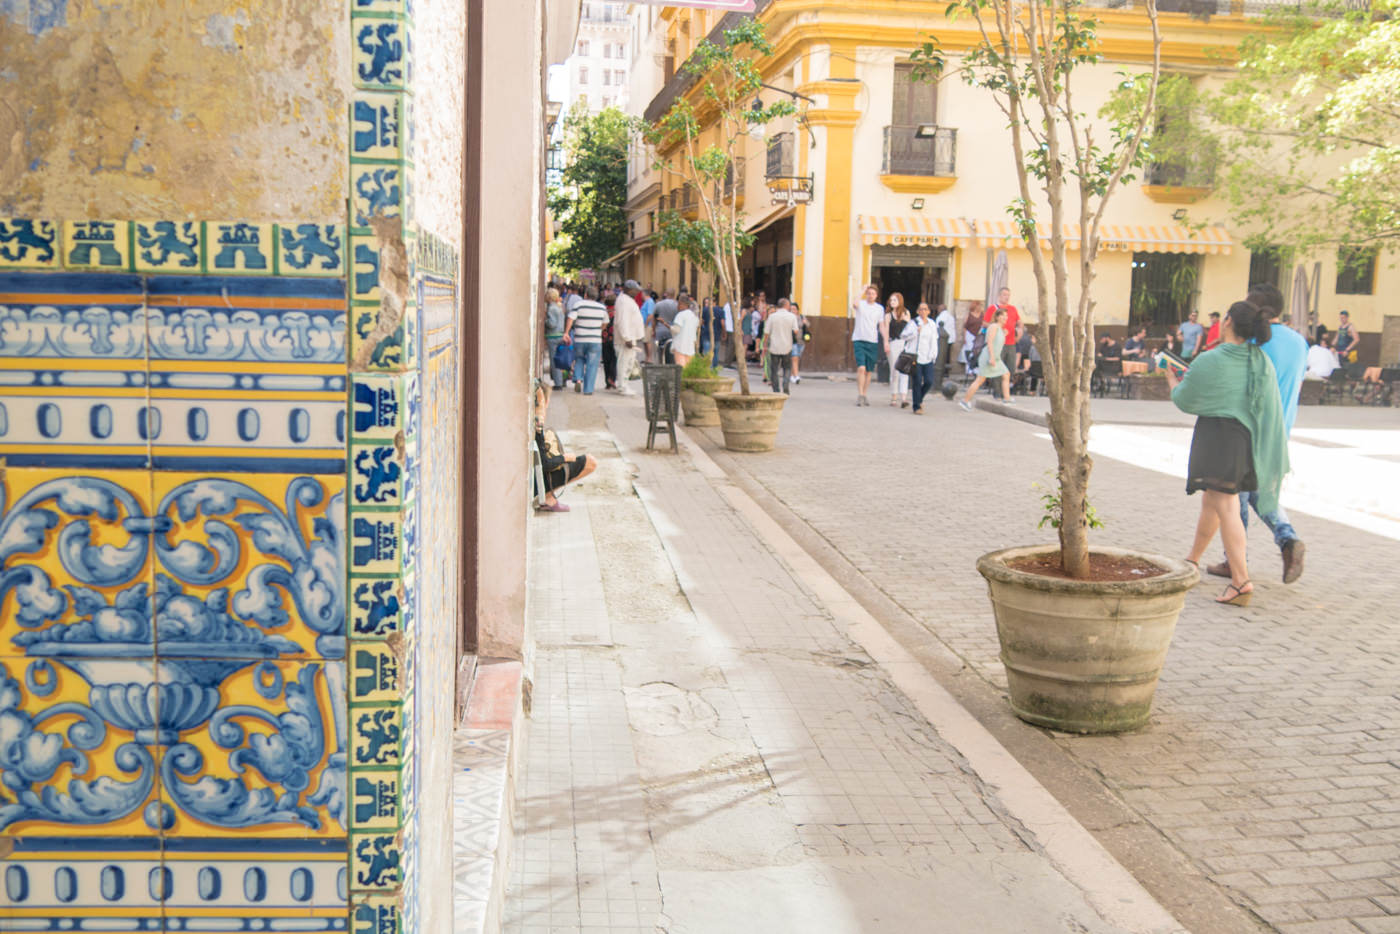 Belebte Straße an dem berühmten Plaza Vieja in Havanna